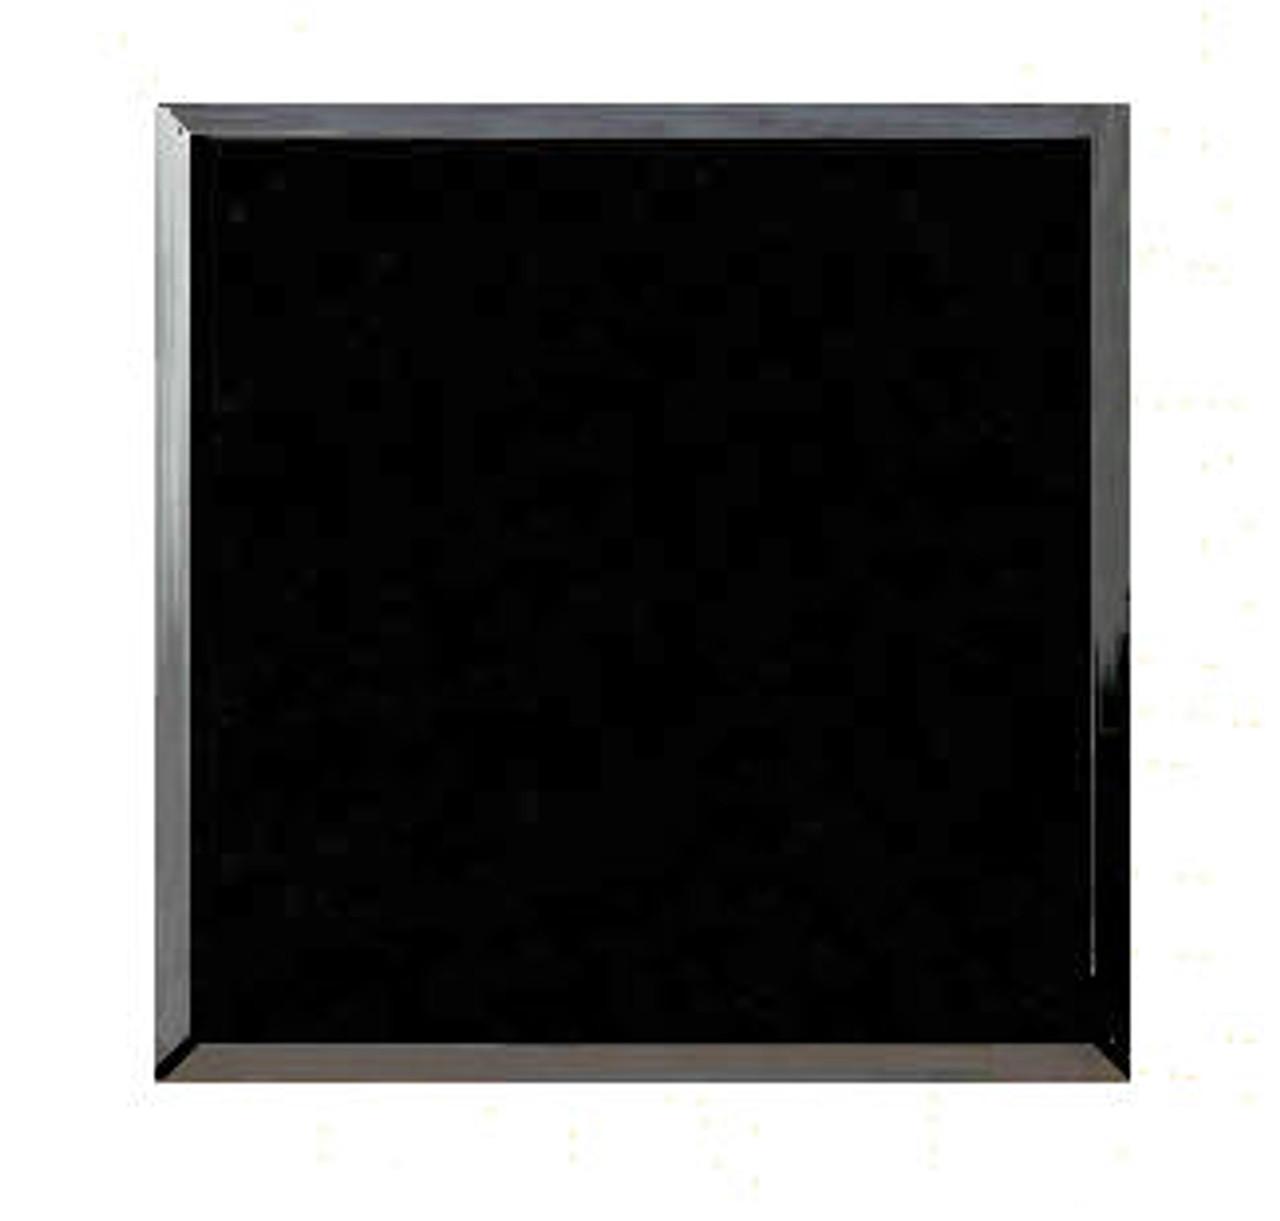 "M-AB-8x10BEP/:  LaserGrade Absolute Black Marble 8 "" x 10"" x 7-8mm, BEP, Beveled Edge Polished, (5F) - Case of 10"